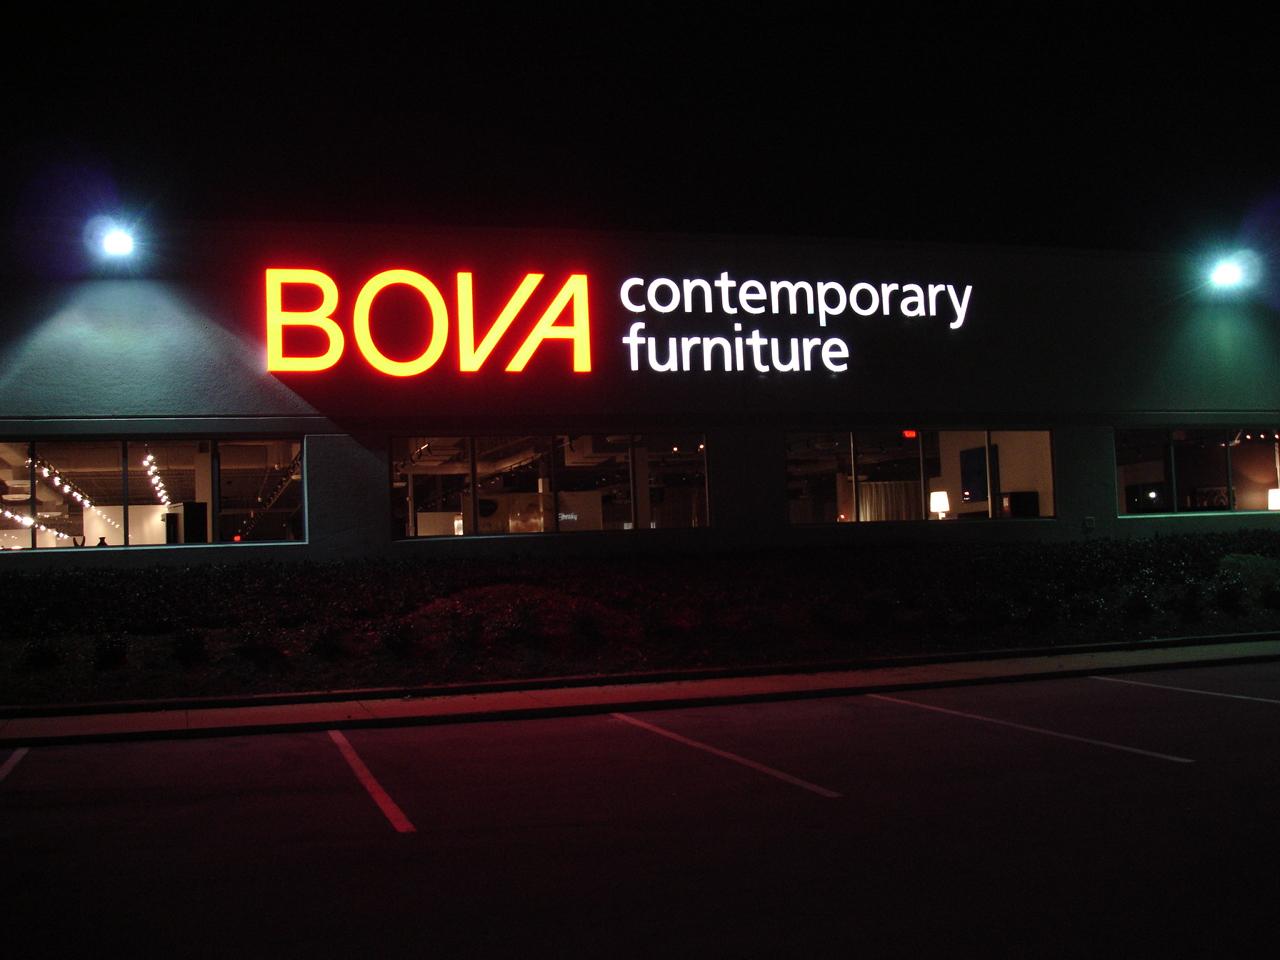 Bova Contemporary Furniture 12000 Baltimore Ave Beltsville